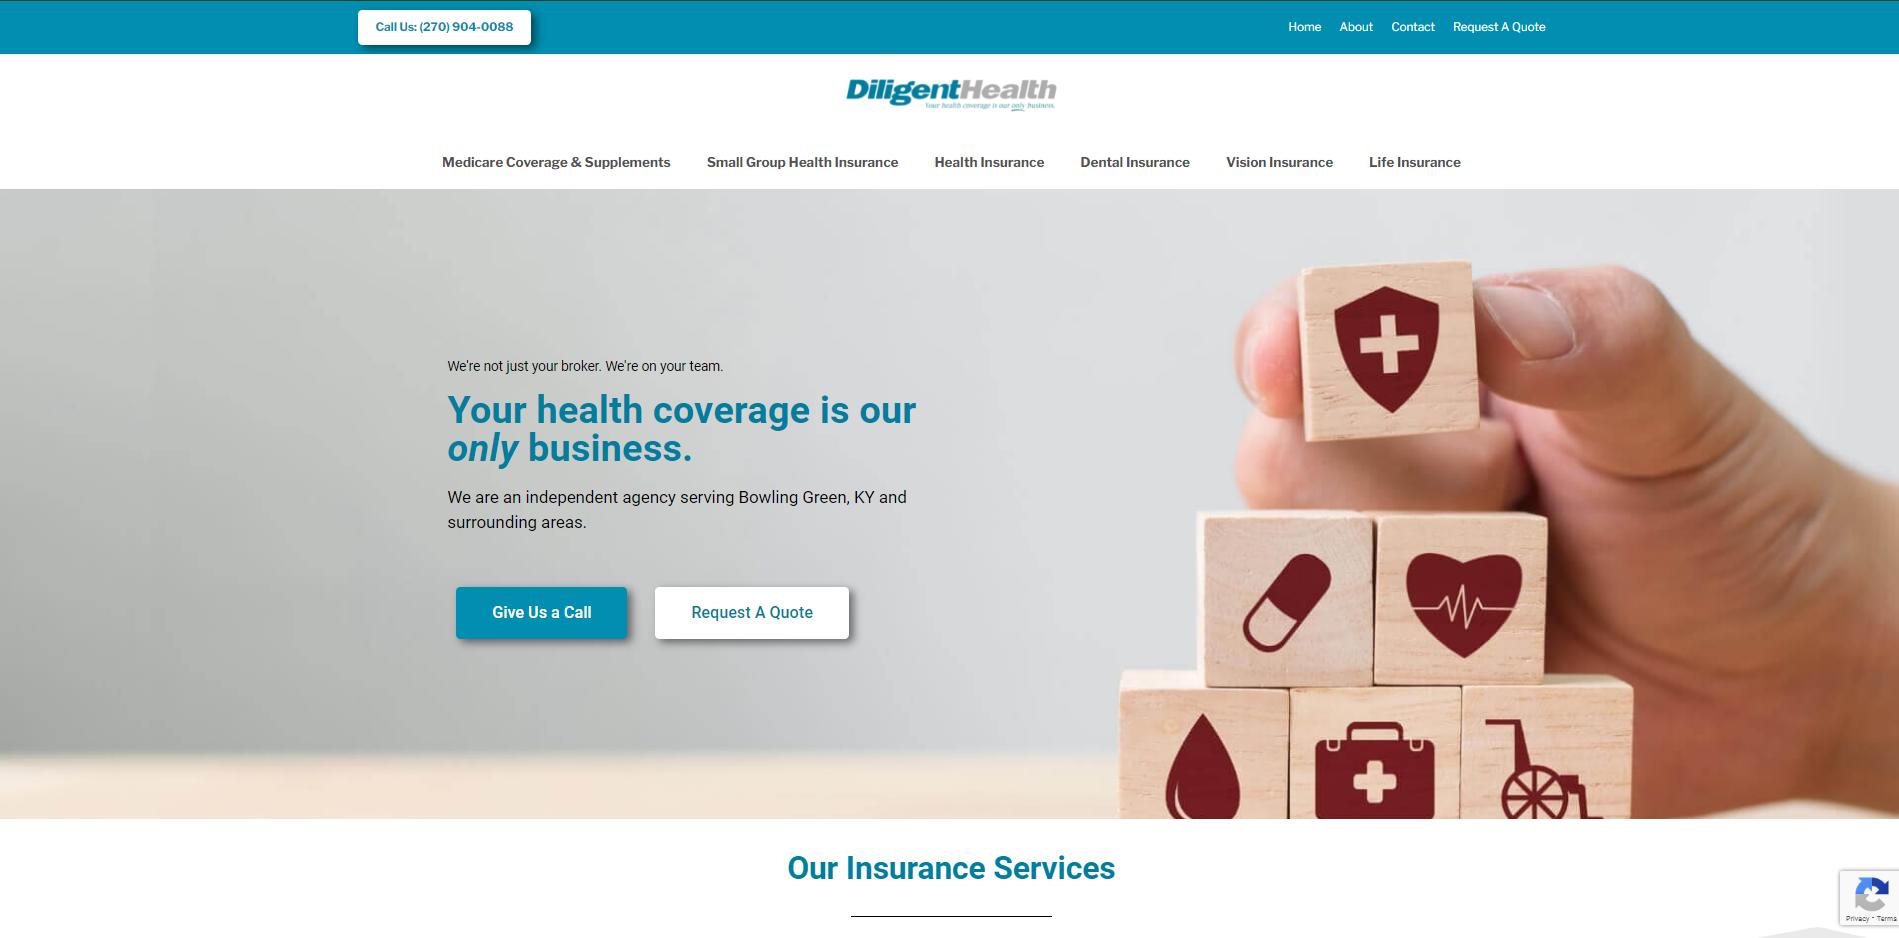 diligenthealth.com Homepage